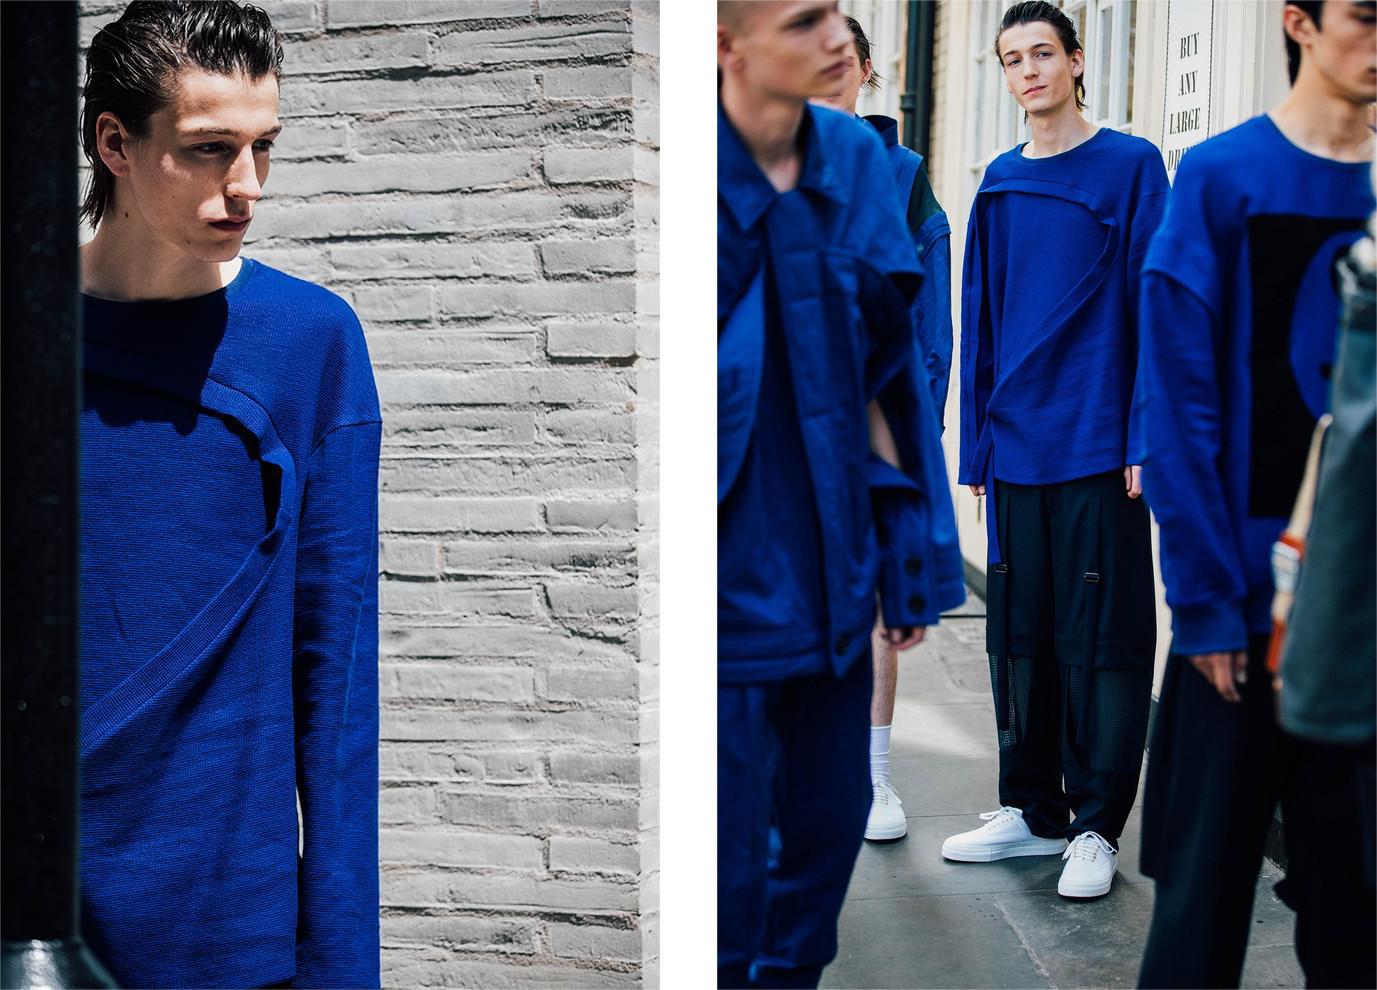 London Fashion week SS18 street style